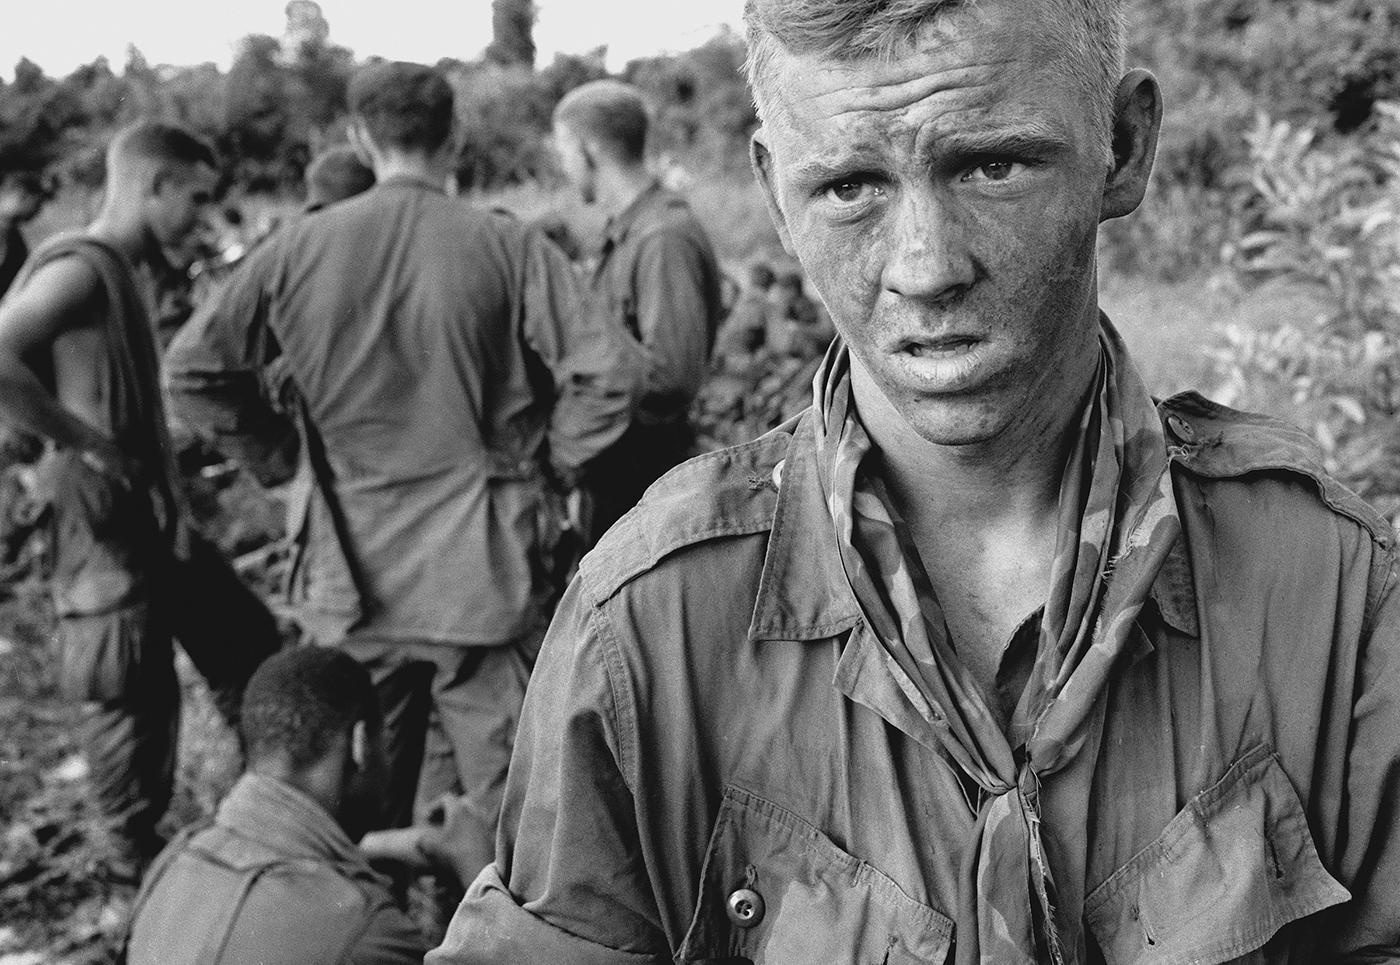 vietnam war - photo #43